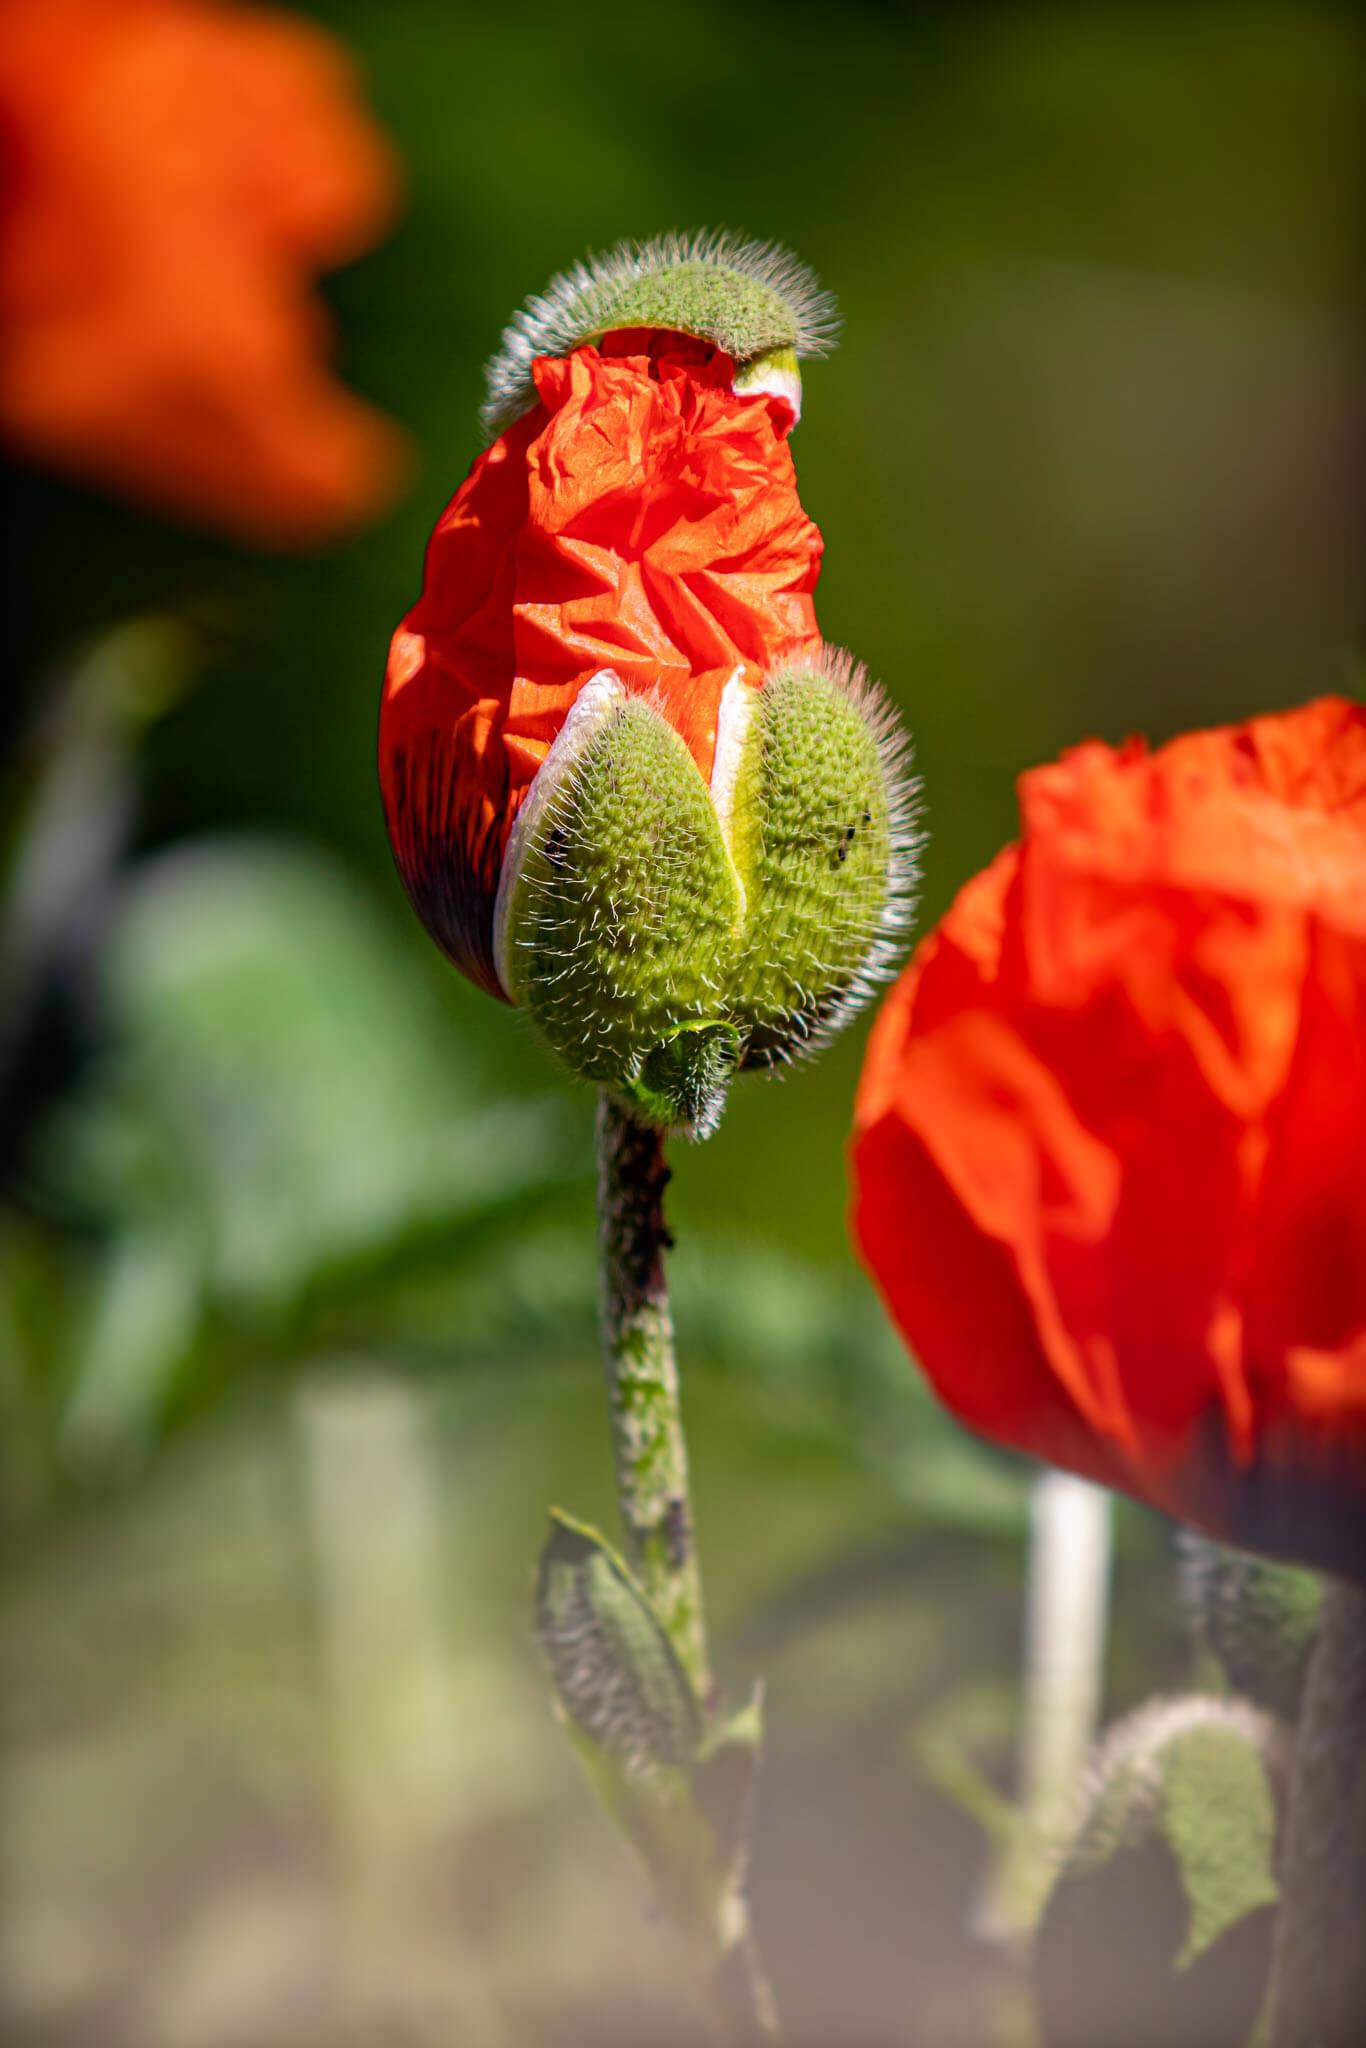 Mohn Poppy Blüte Erblühen Natur